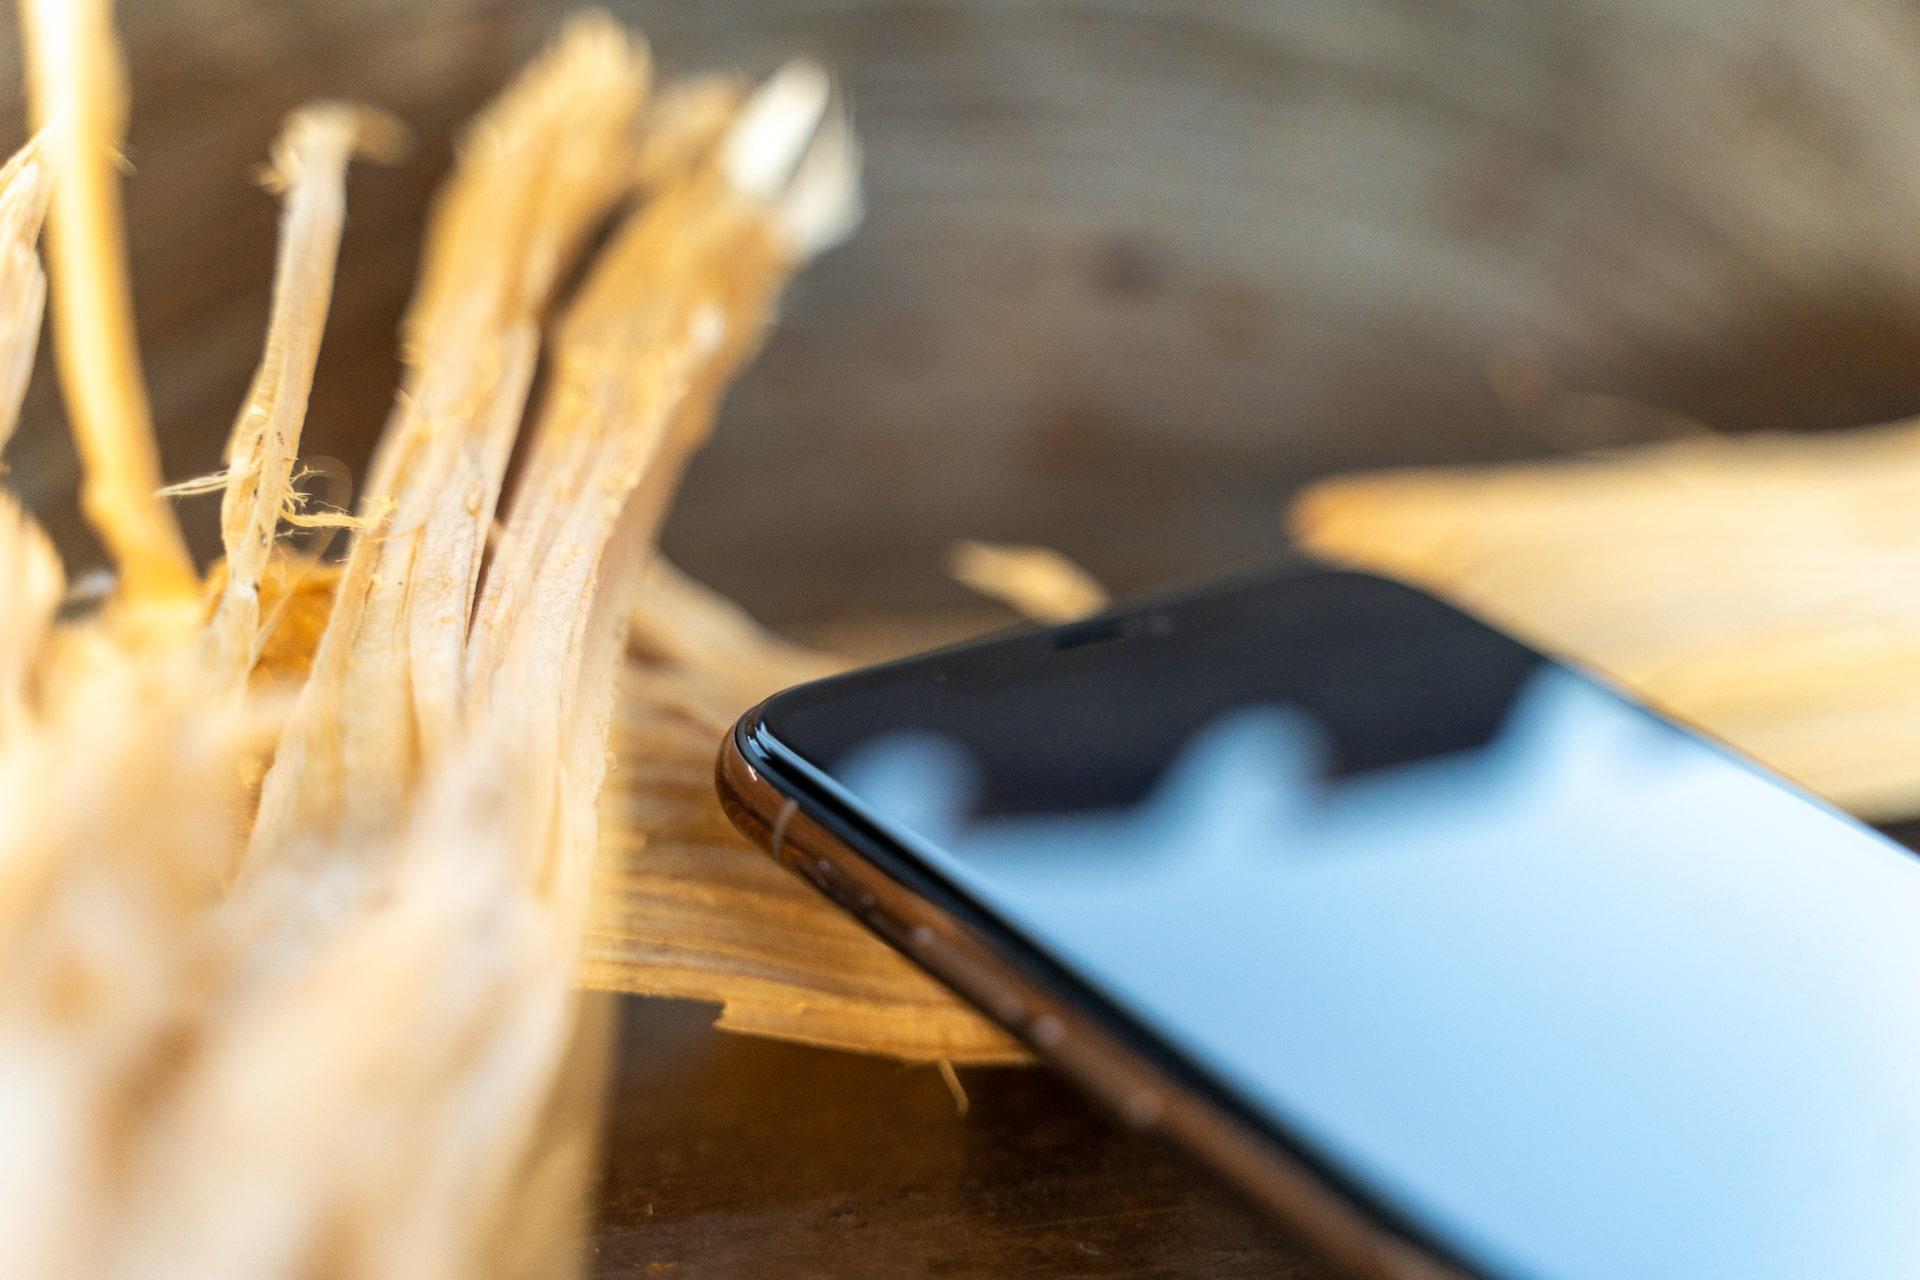 Optimaler Schutz für das iPhone 11 Pro dank CellBee, Hack4Life, Review, Testbericht, Fabian Geissler, Apple, iPhone, Holz, Kreissäge, Handwerker